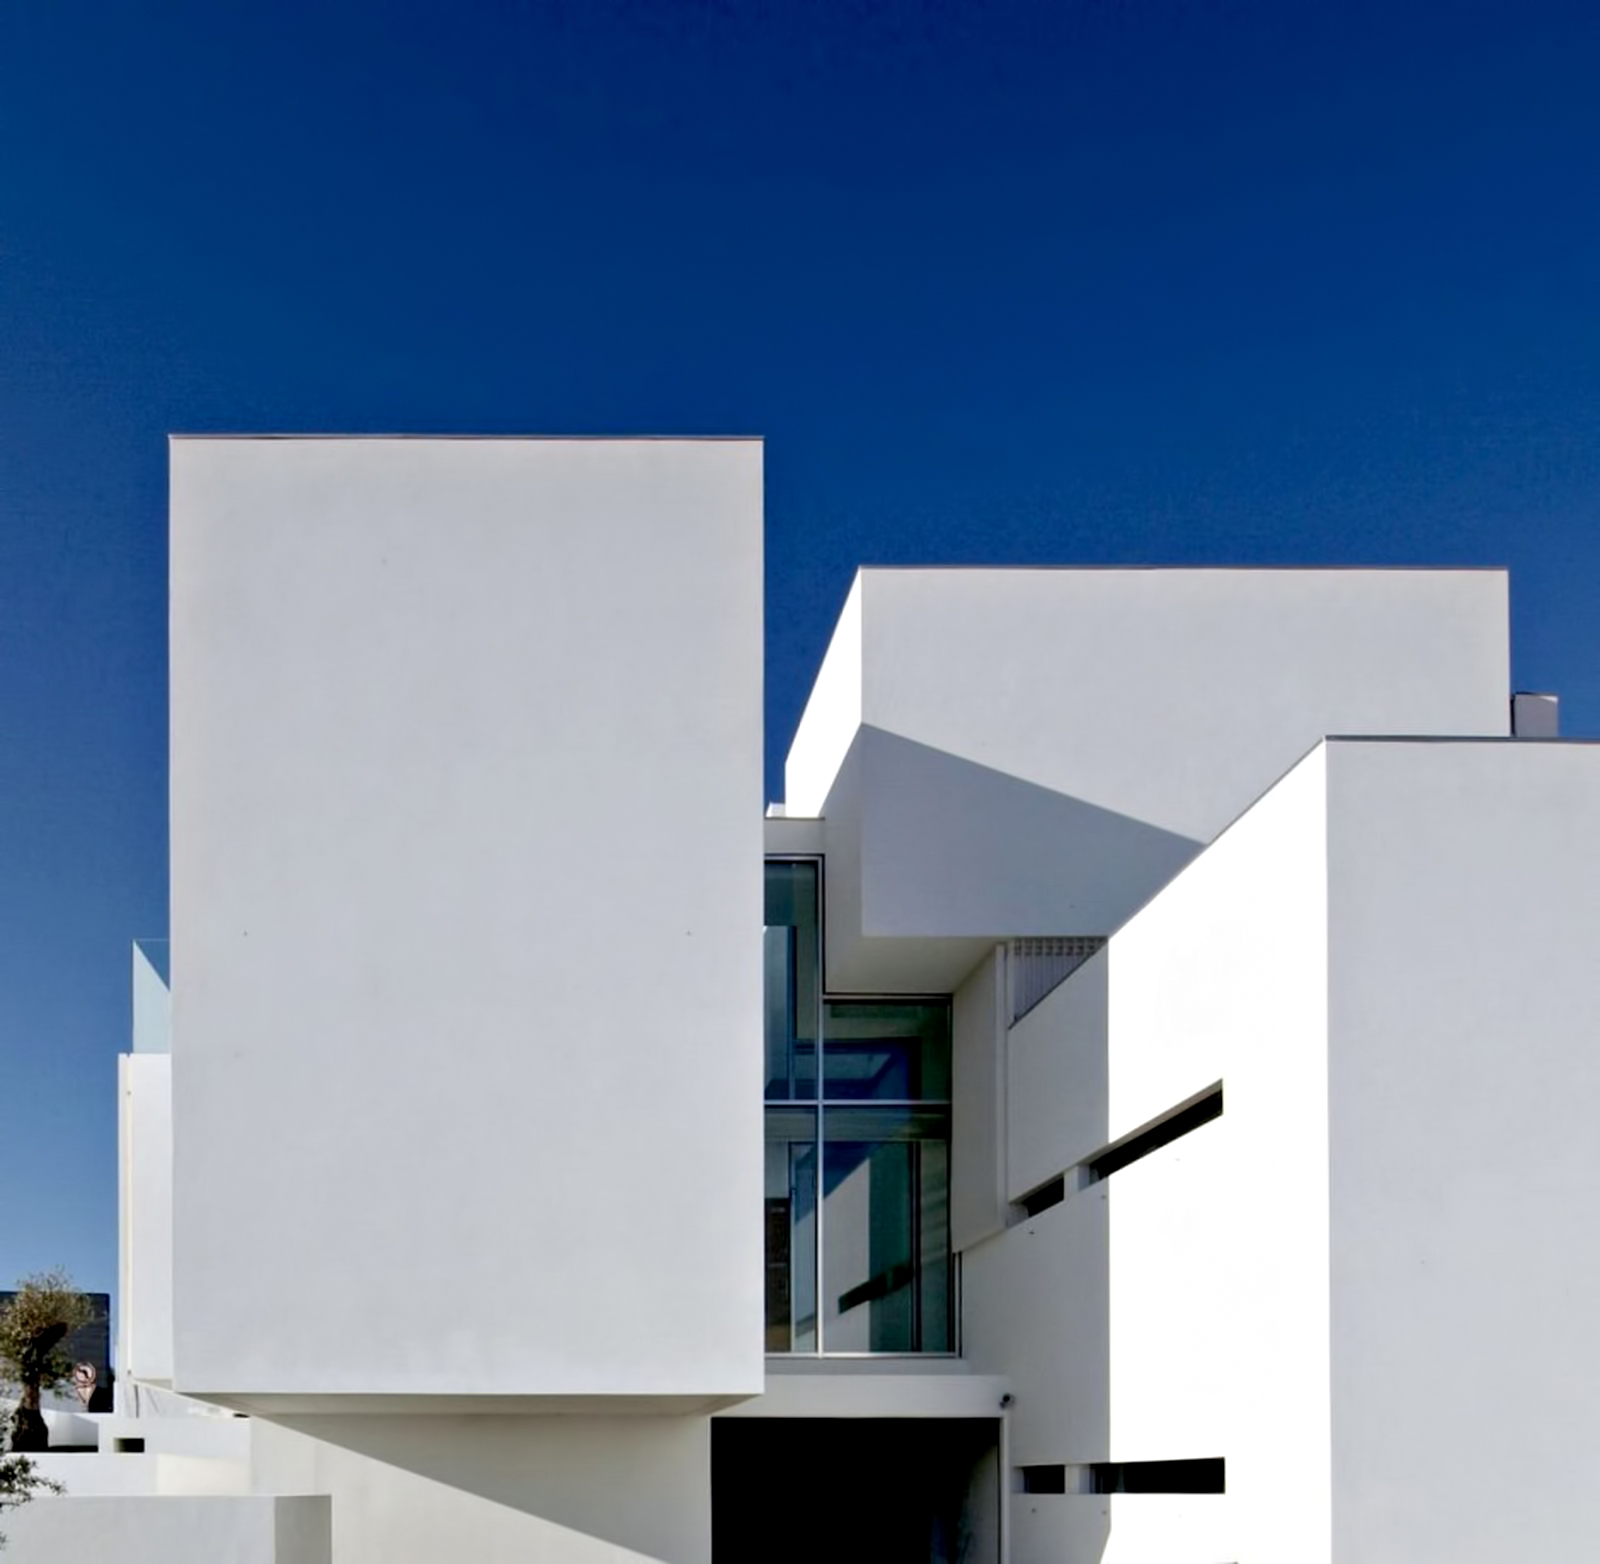 25 – Paco de Arcos House – Oeiras, Lisbon, Portugal